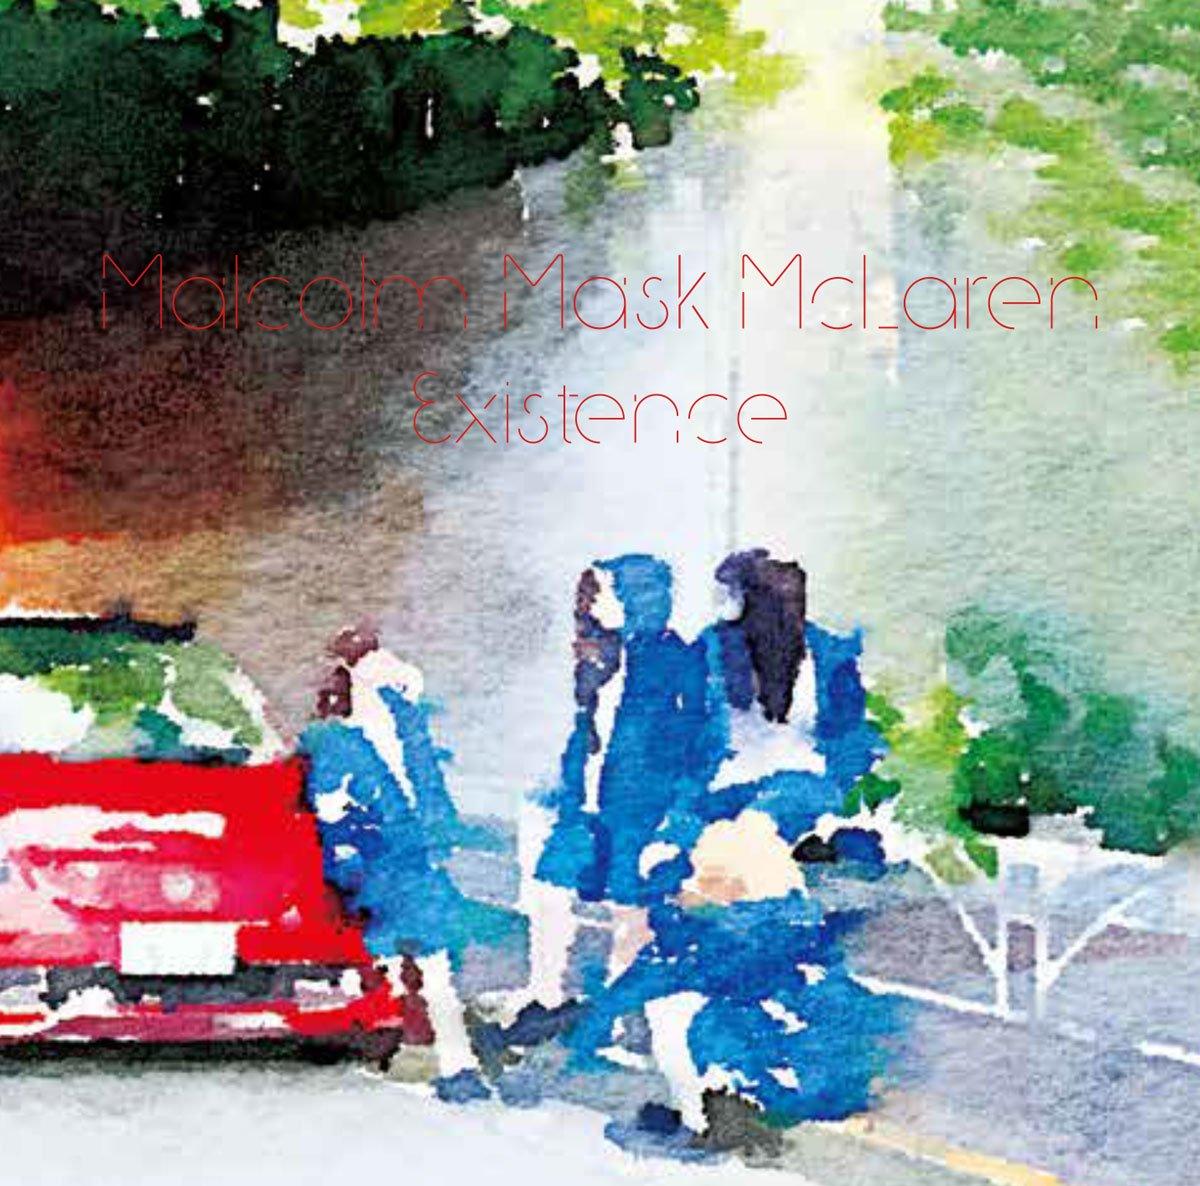 Underground Alternative Metal Idols Downloads Single Malcolm Mask Maclaren Existence